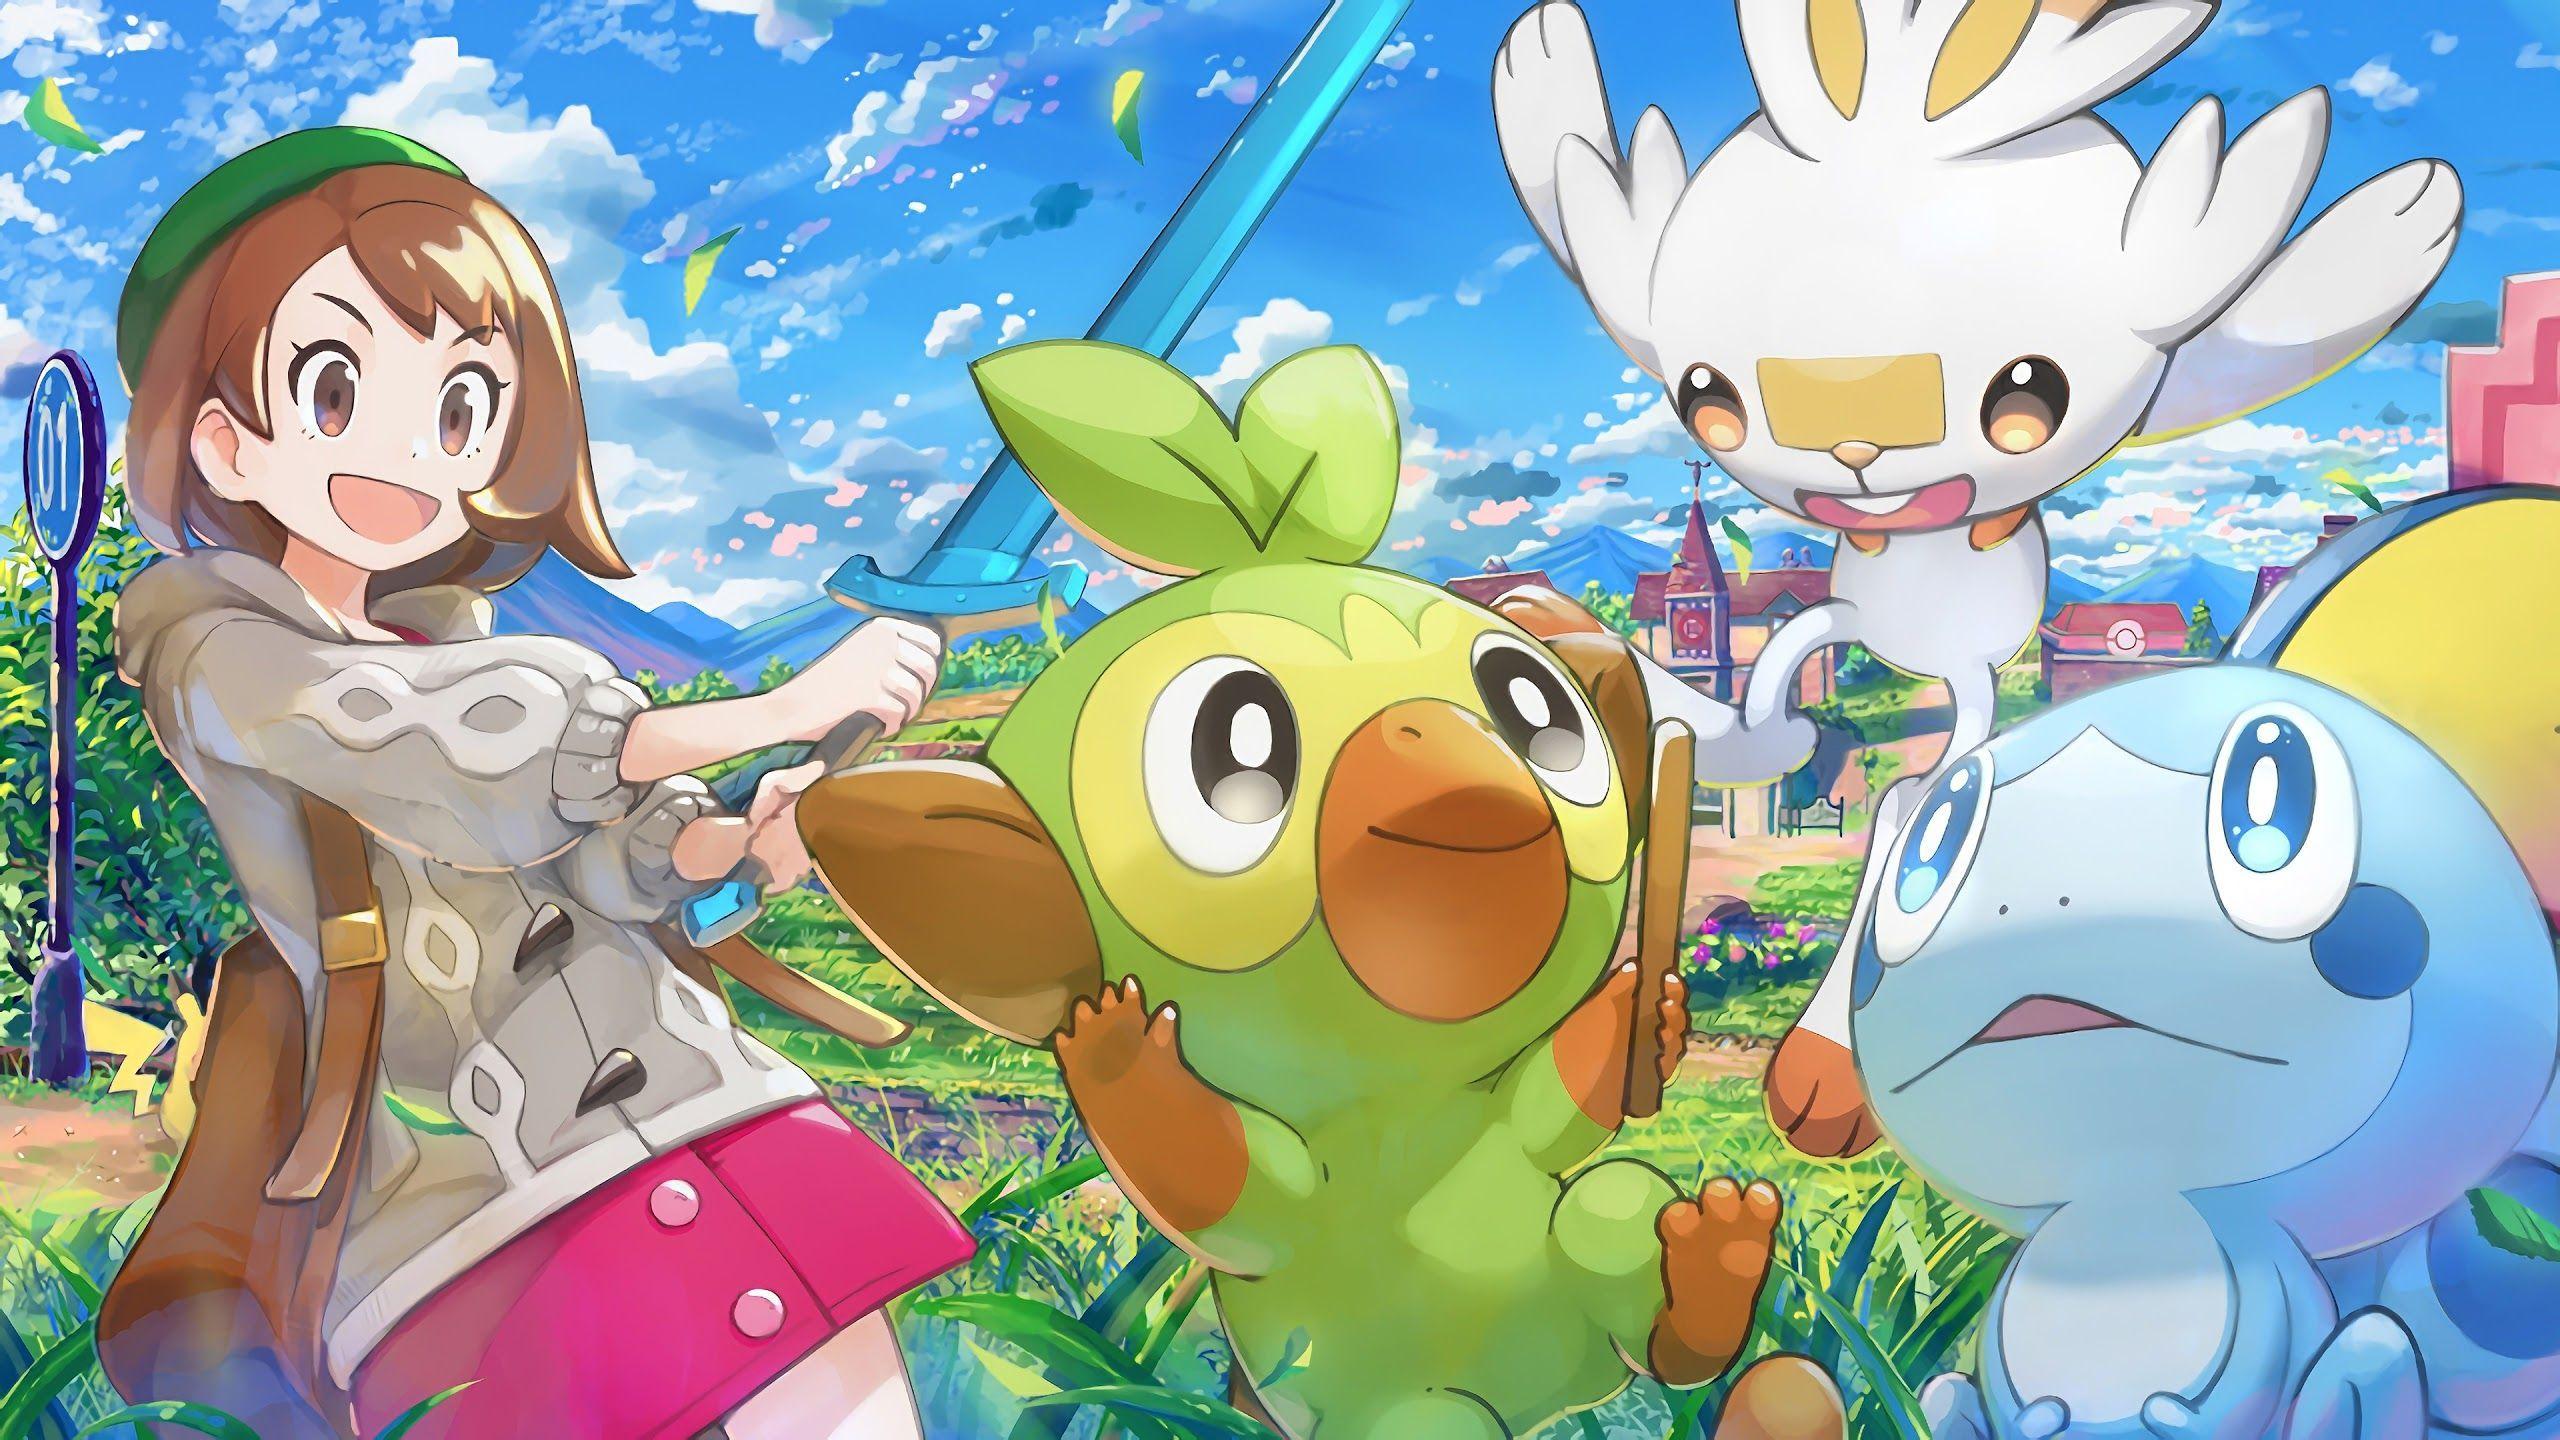 Pokémon Sword And Shield Desktop HD Wallpapers - Wallpaper ...